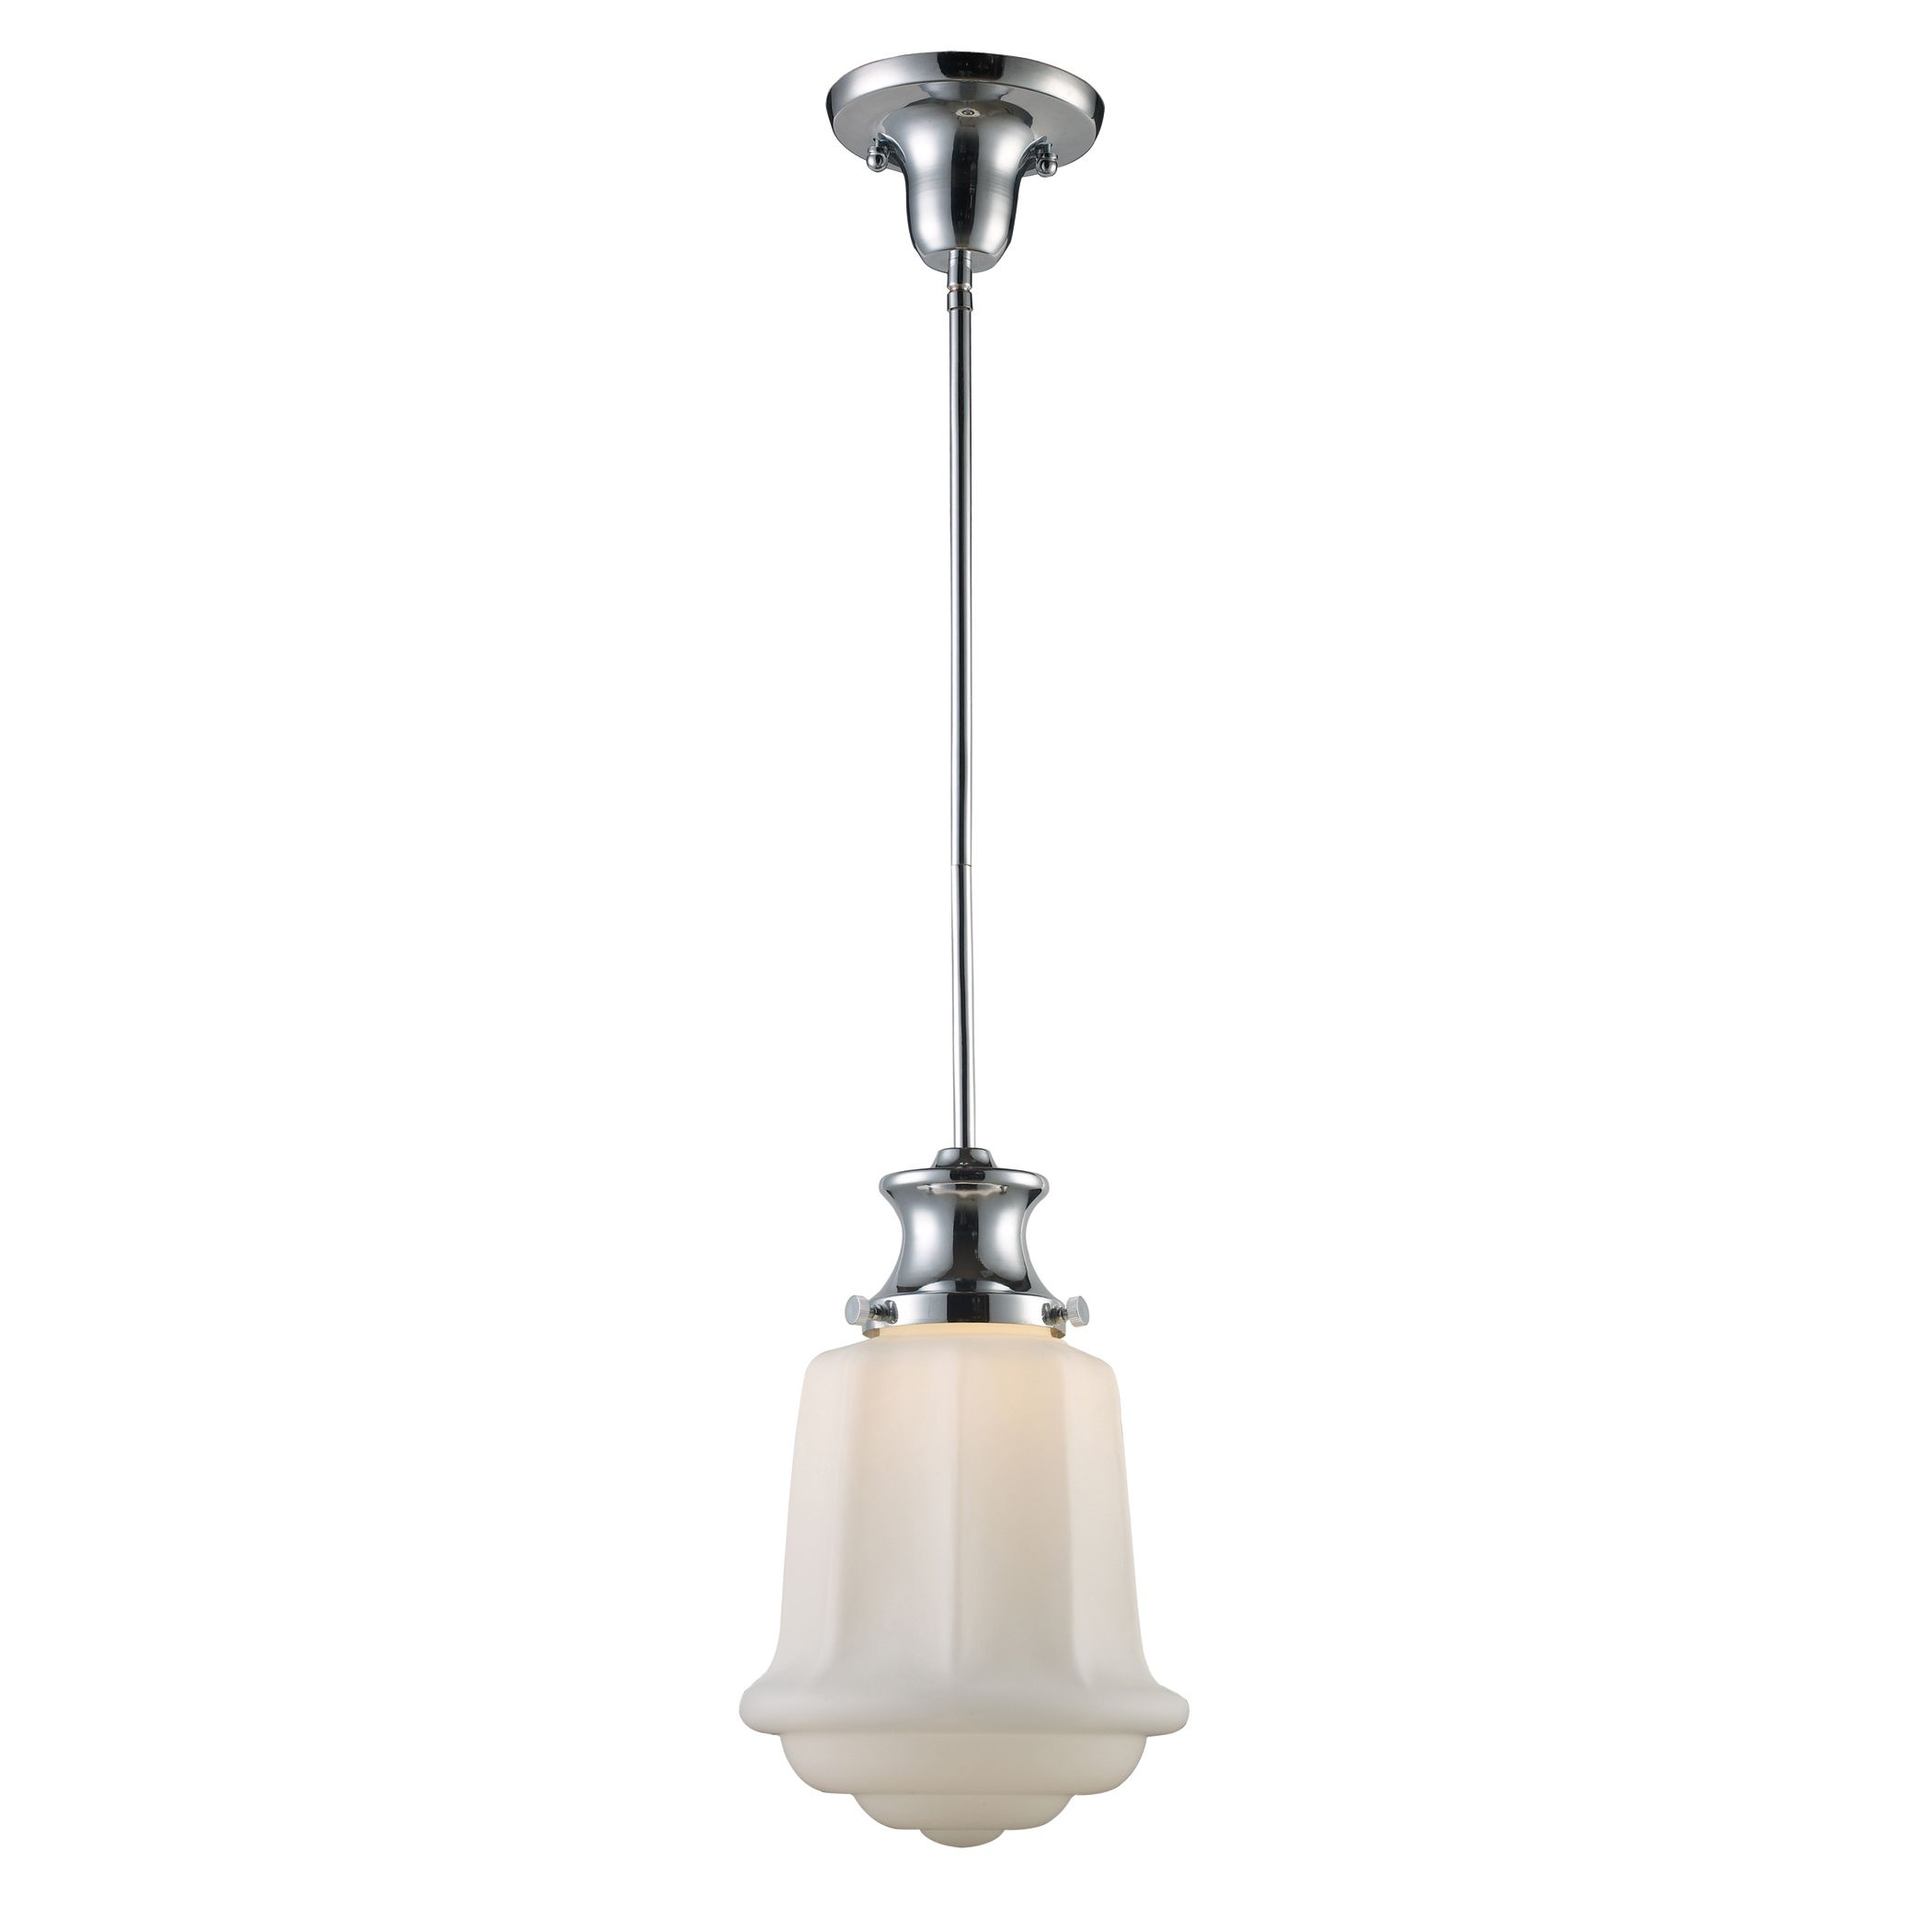 69023-1 Schoolhouse 1-Light Pendant in Polished Chrome